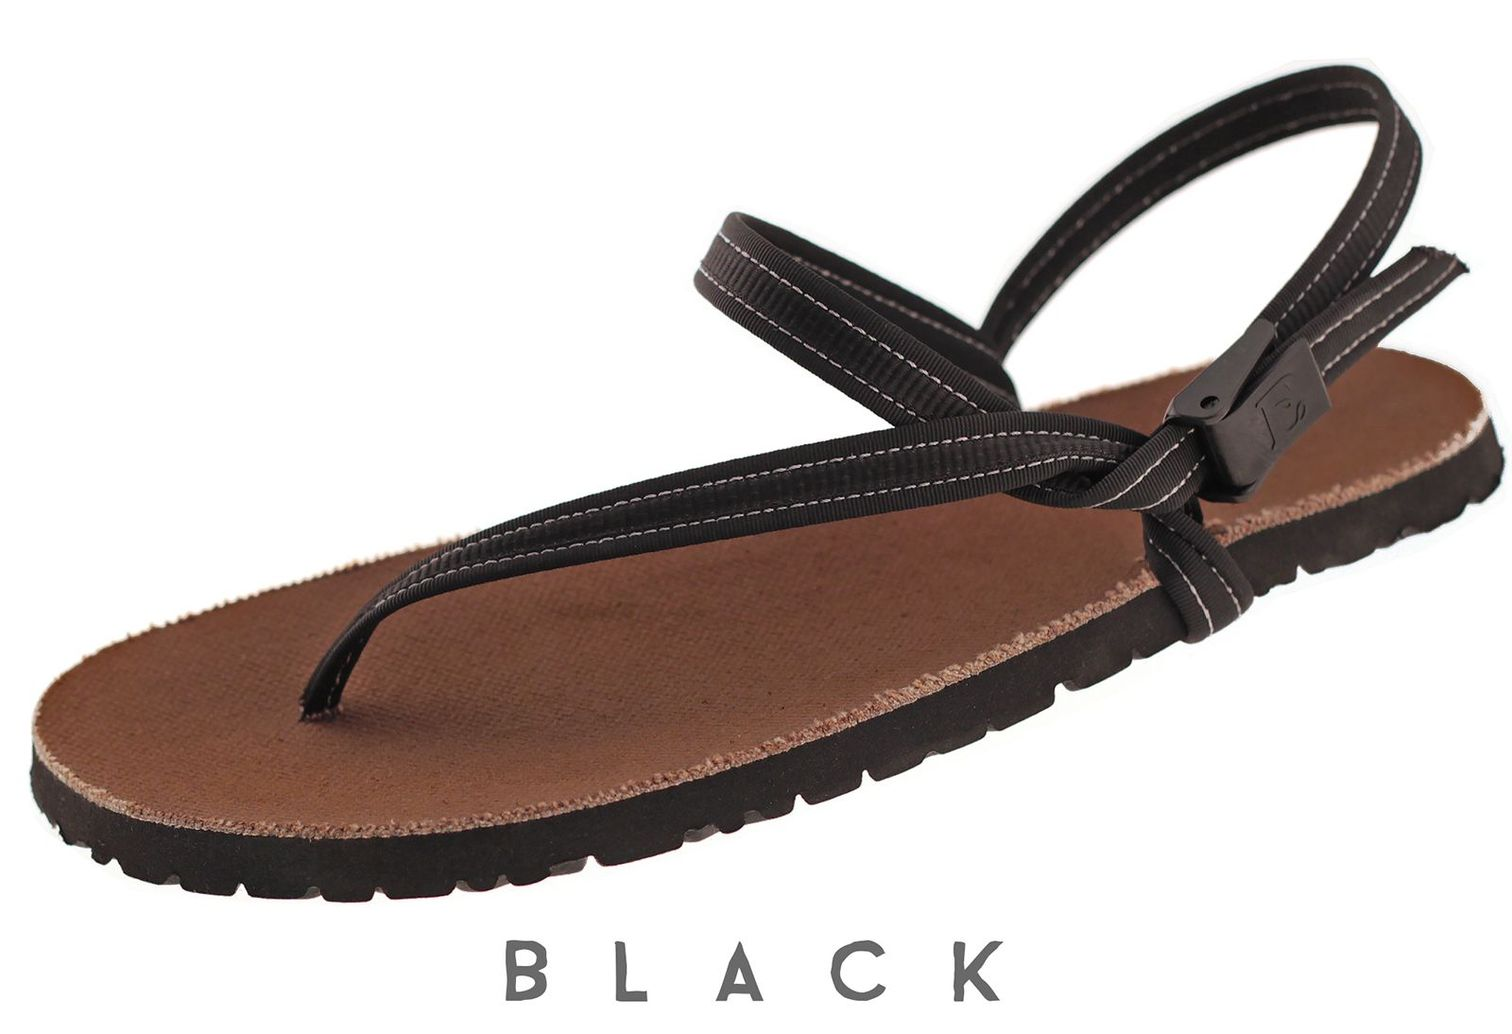 Alpha Adventure Sandals Picture 1